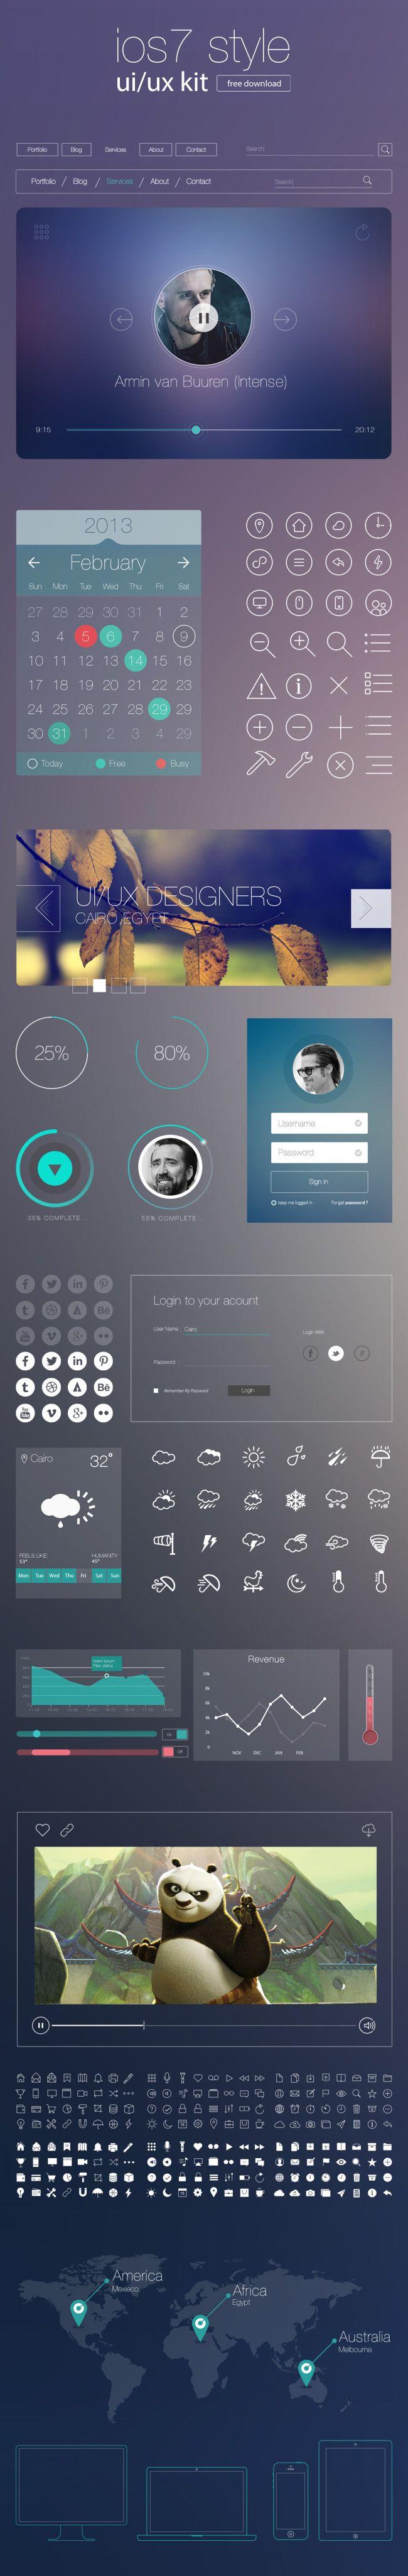 Learn mobile ui designers